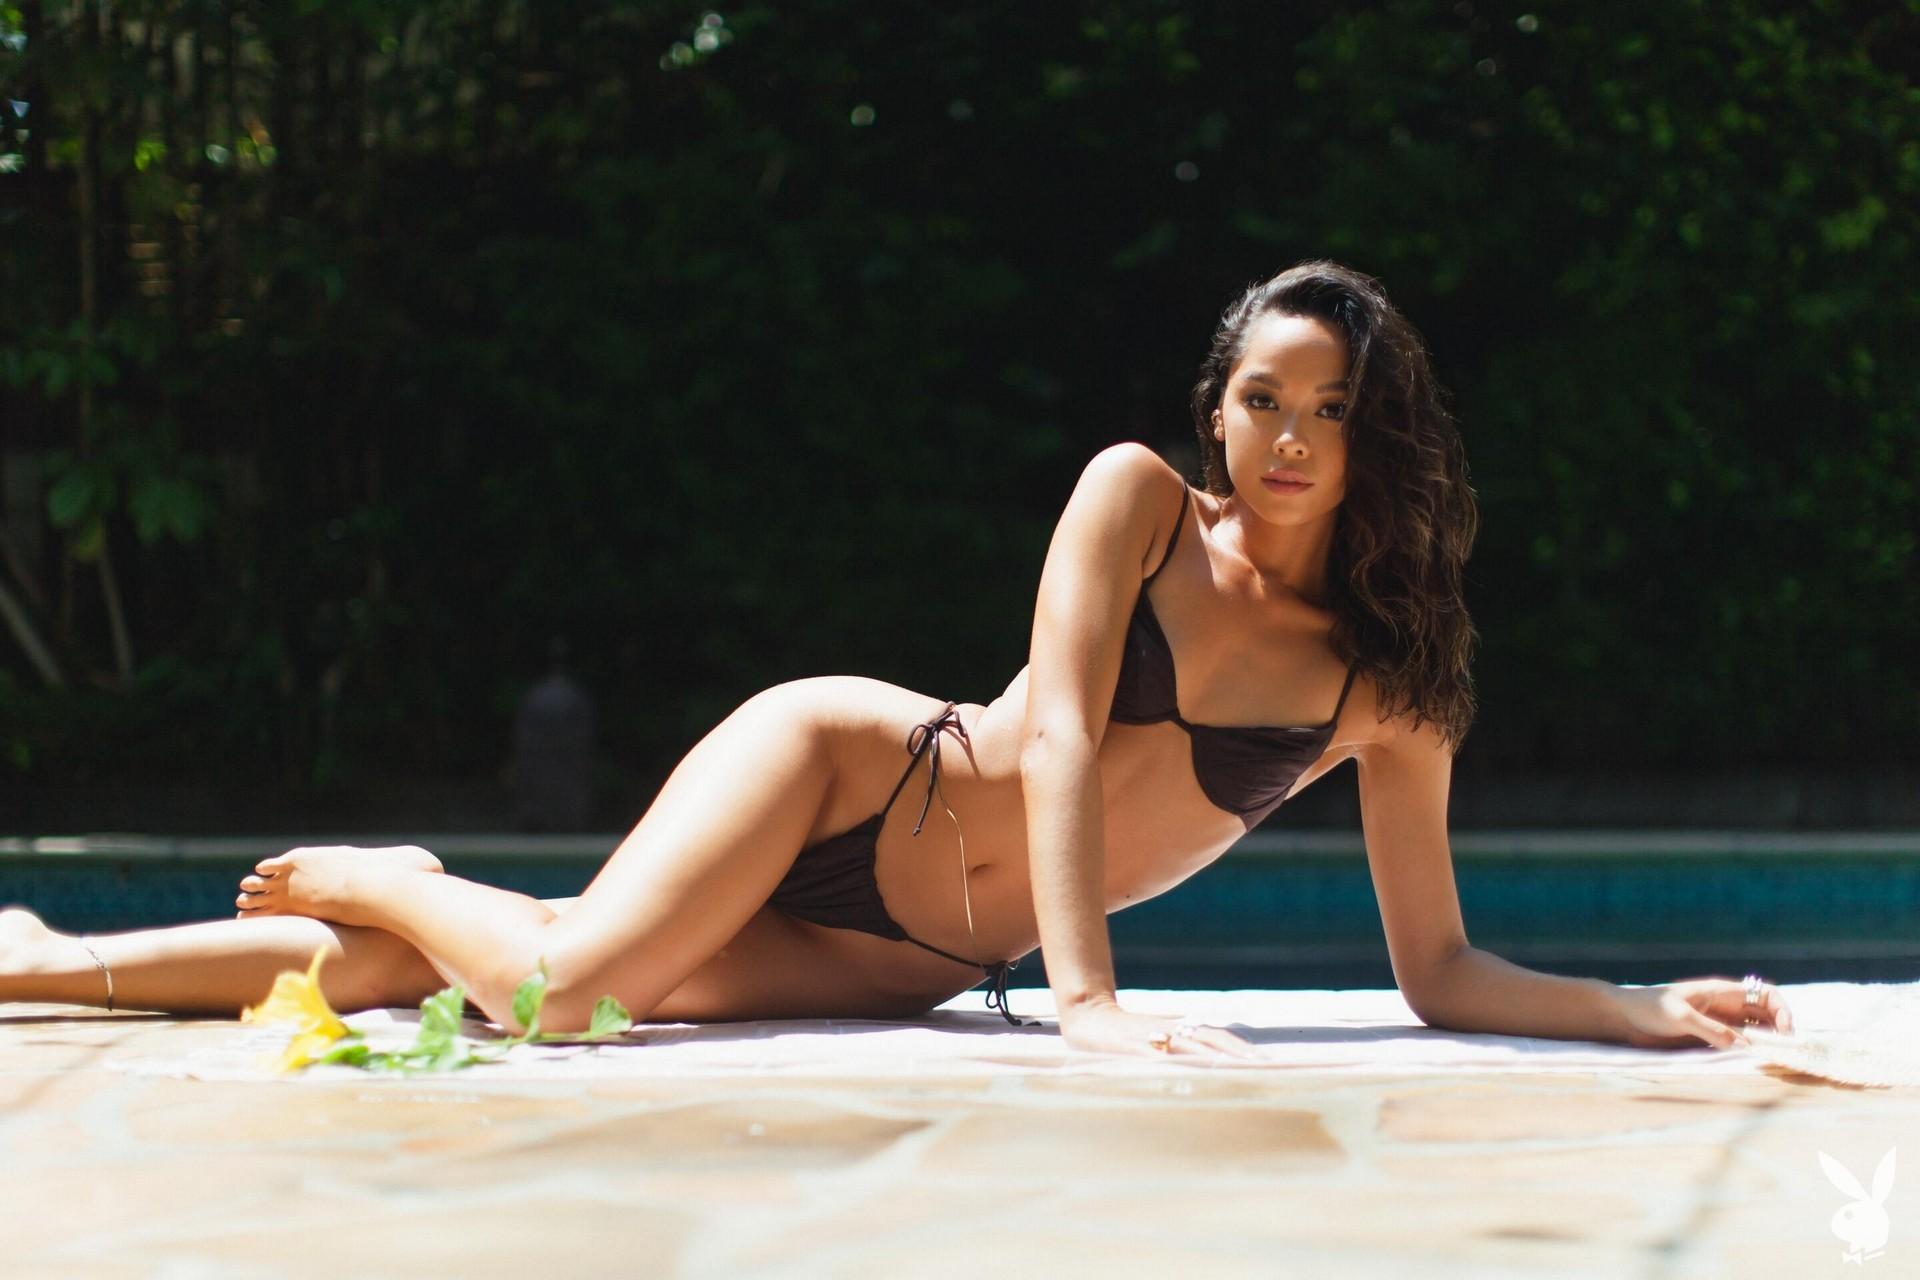 Danielle Alcaraz Playmate Outtakes Playboy Plus (1)